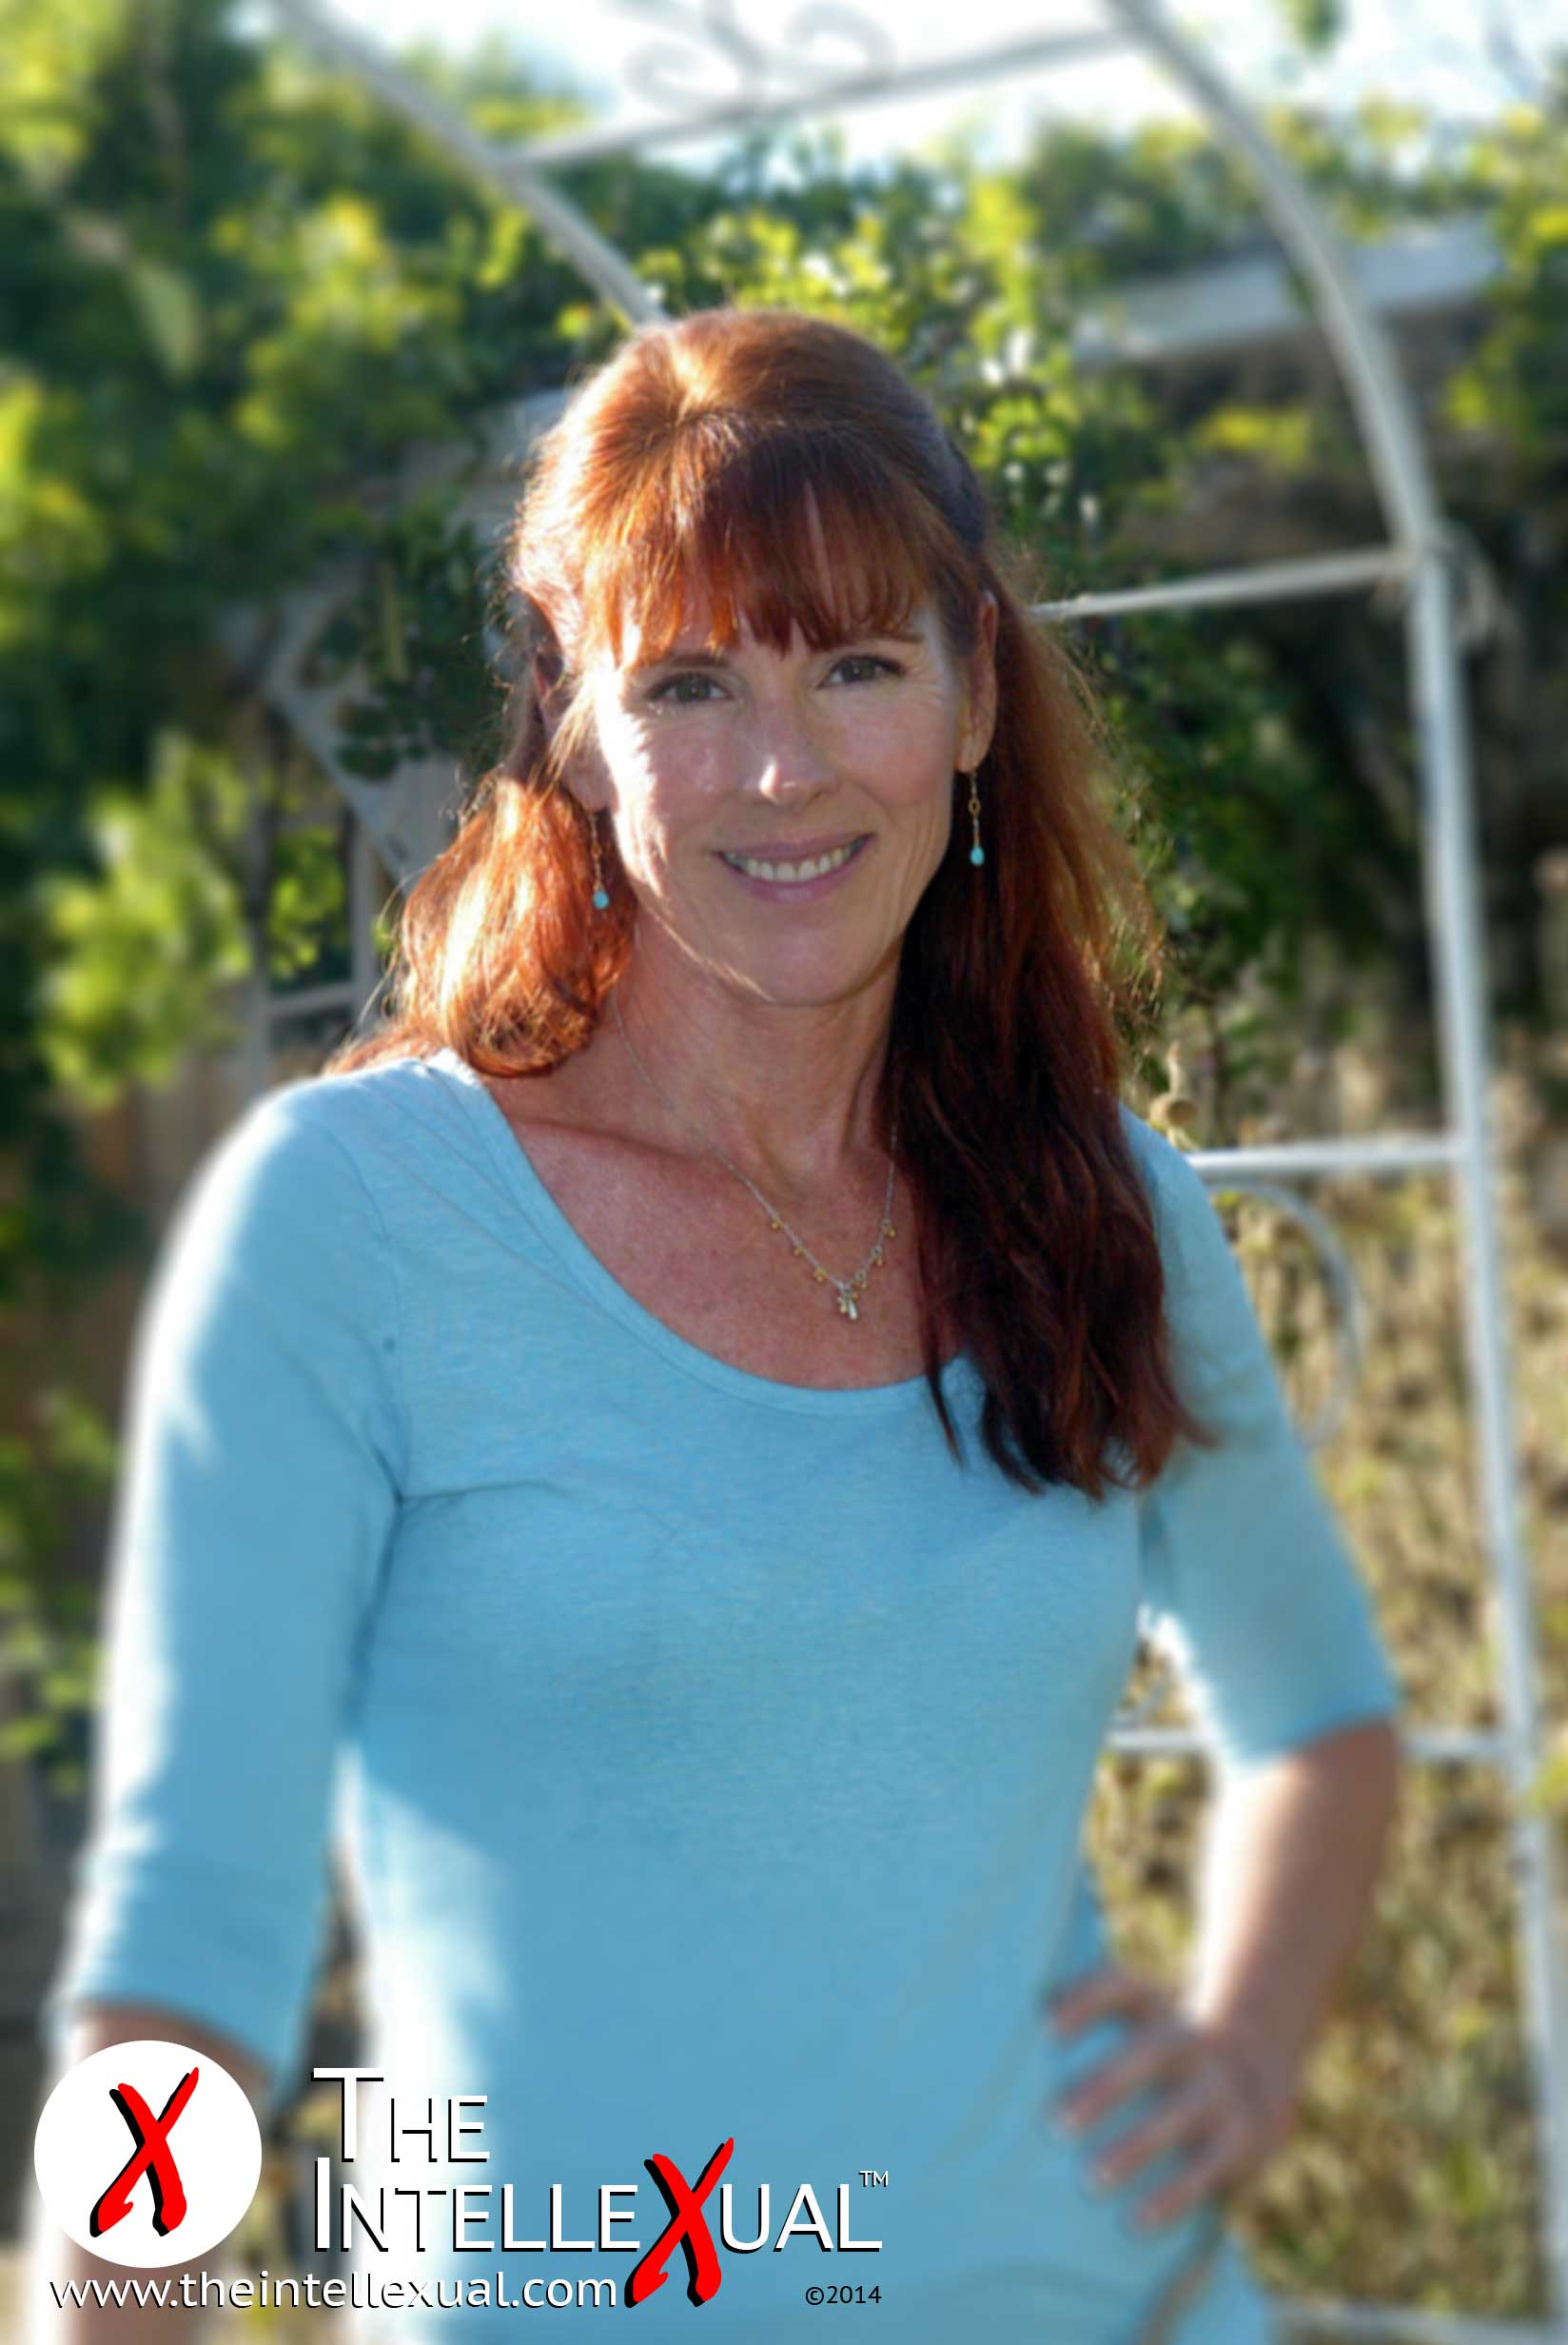 Discussion on this topic: Melinda O. Fee, patricia-tallman/